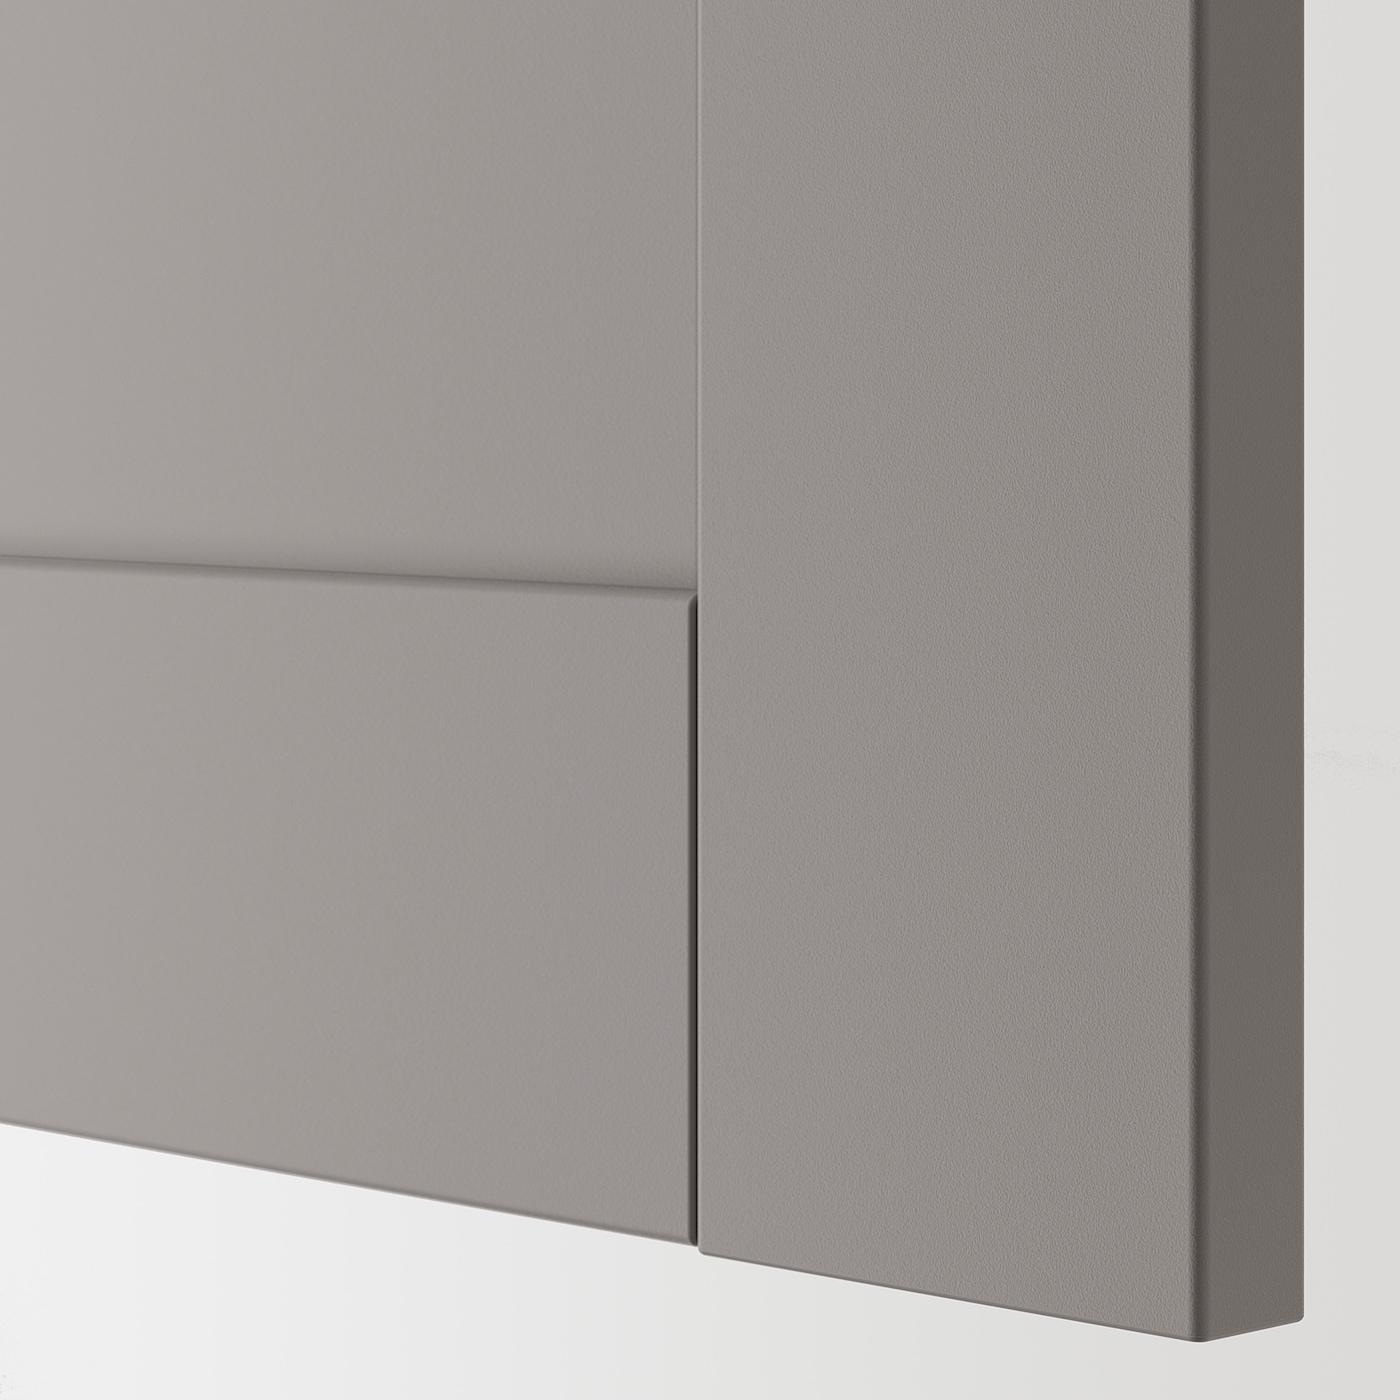 ENHET Drawer front, grey frame, 60x30 cm